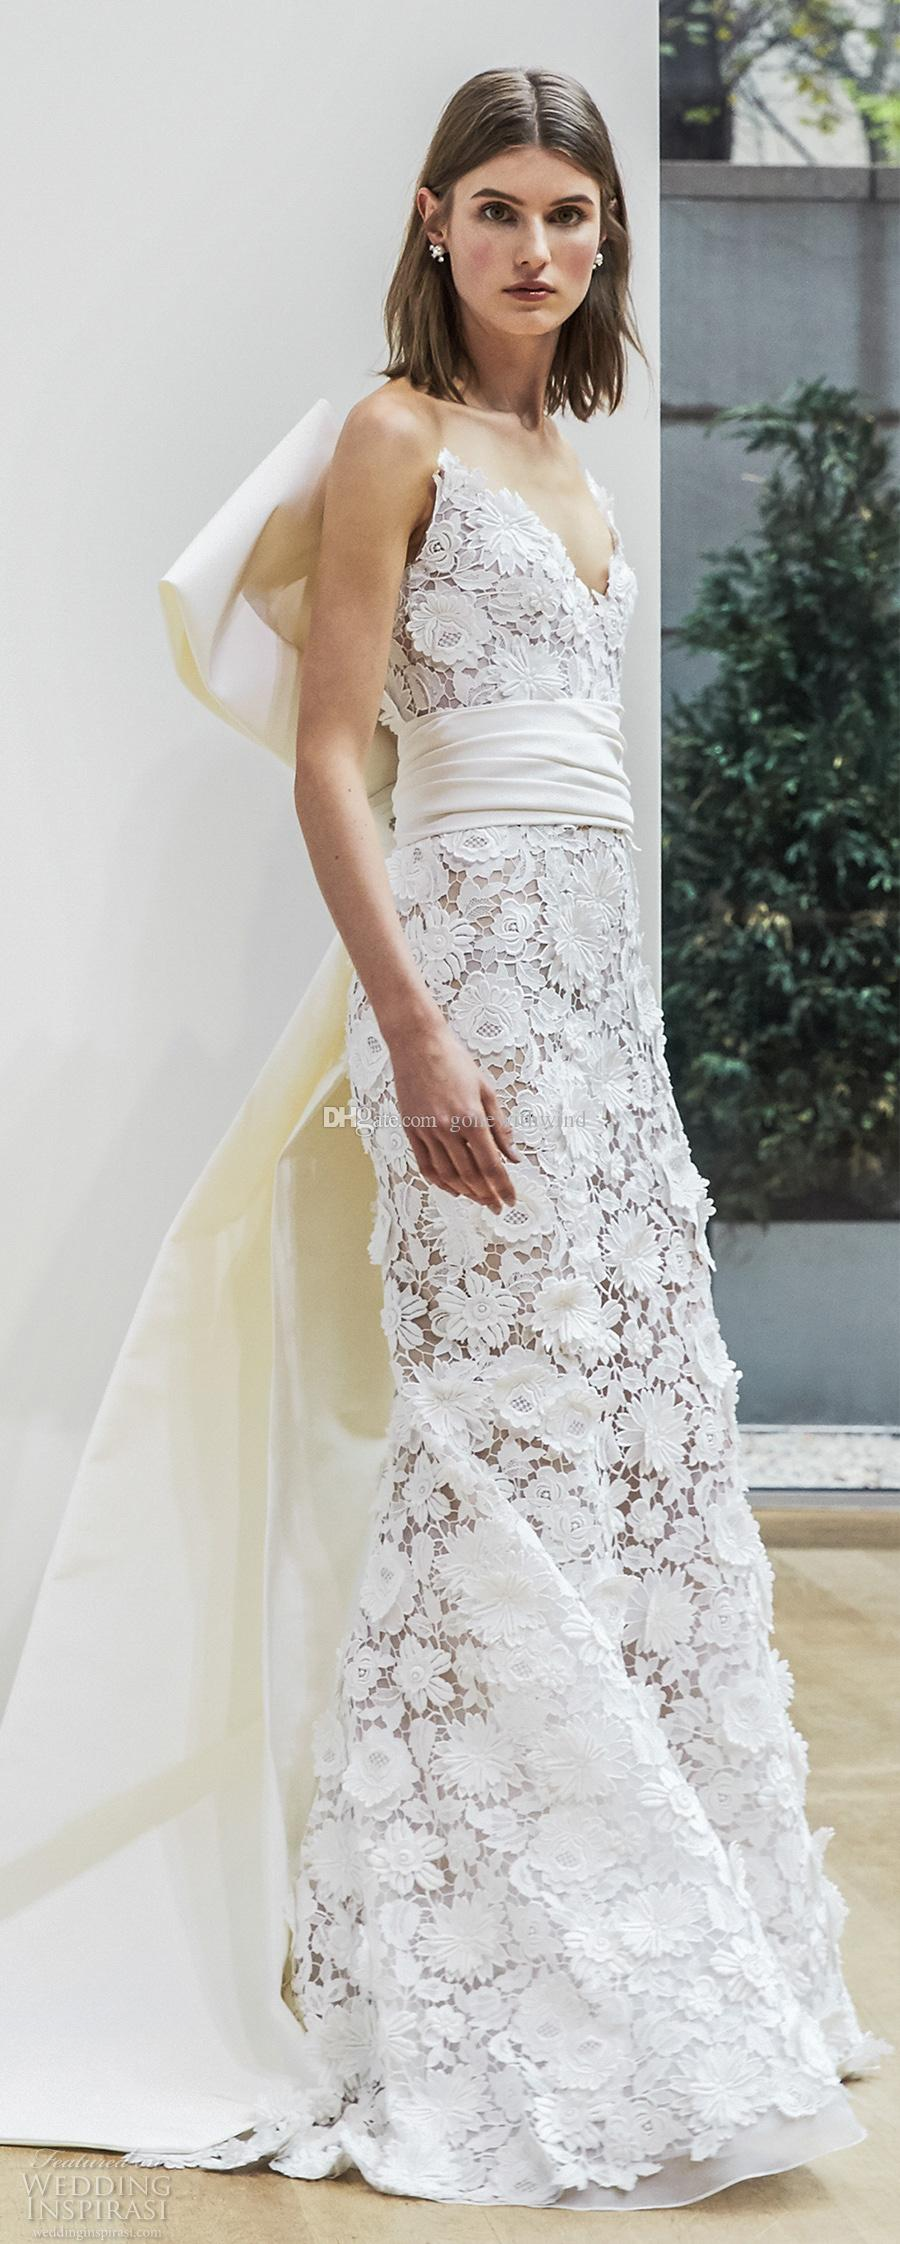 Fantastisch Oscar De La Renta Brautkleider Preis Fotos ...